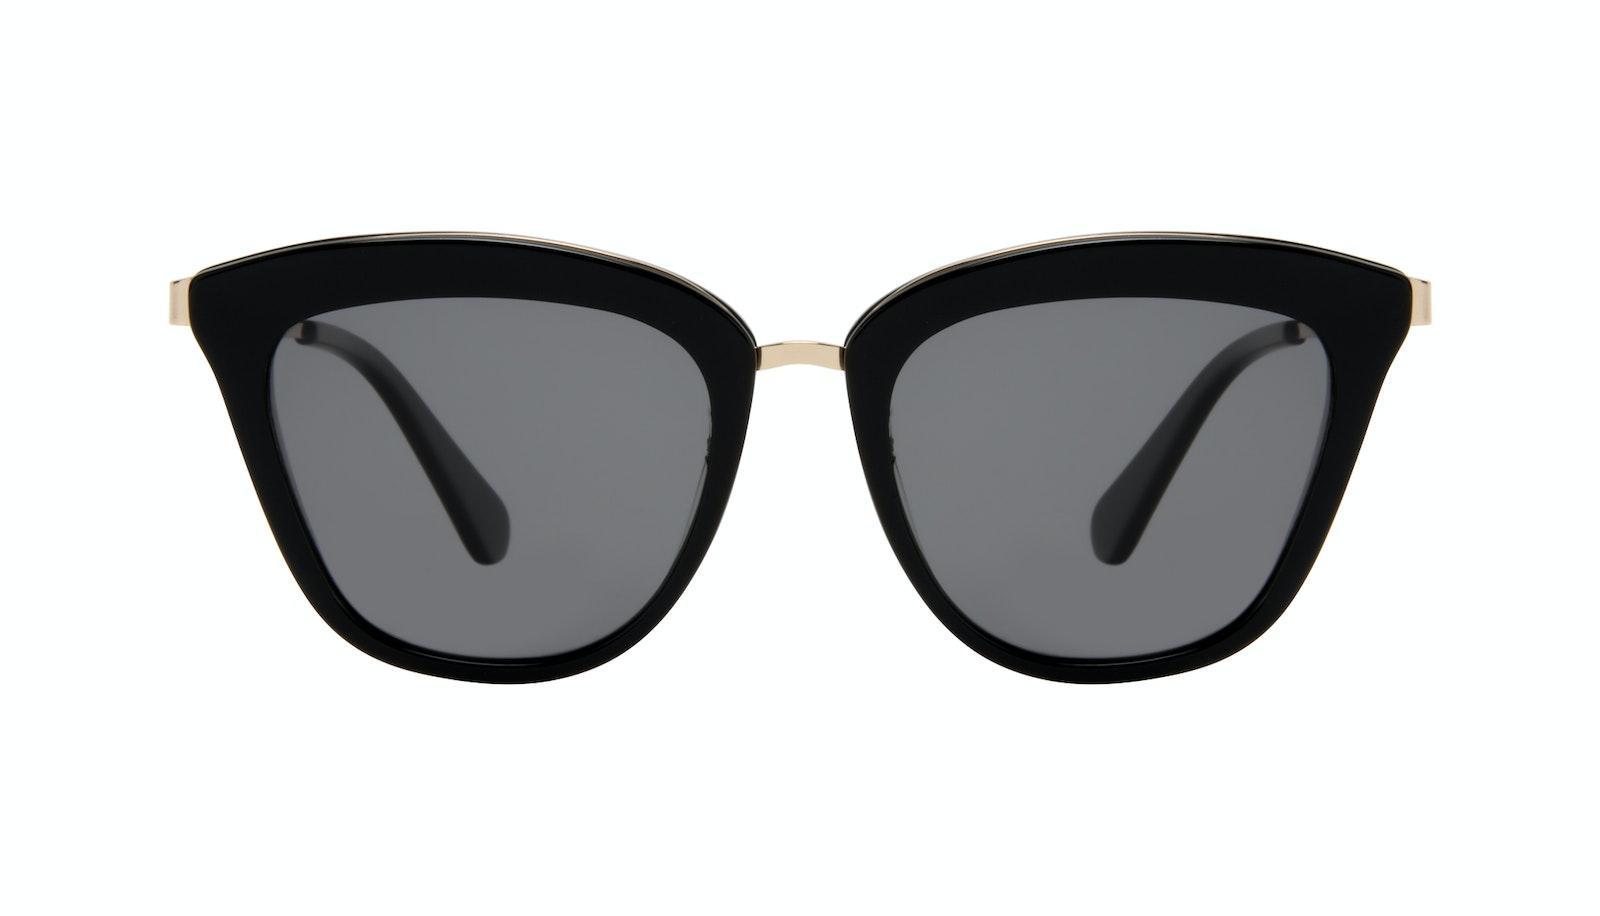 f91176eee40 Affordable Fashion Glasses Cat Eye Sunglasses Women More Petite Onyx